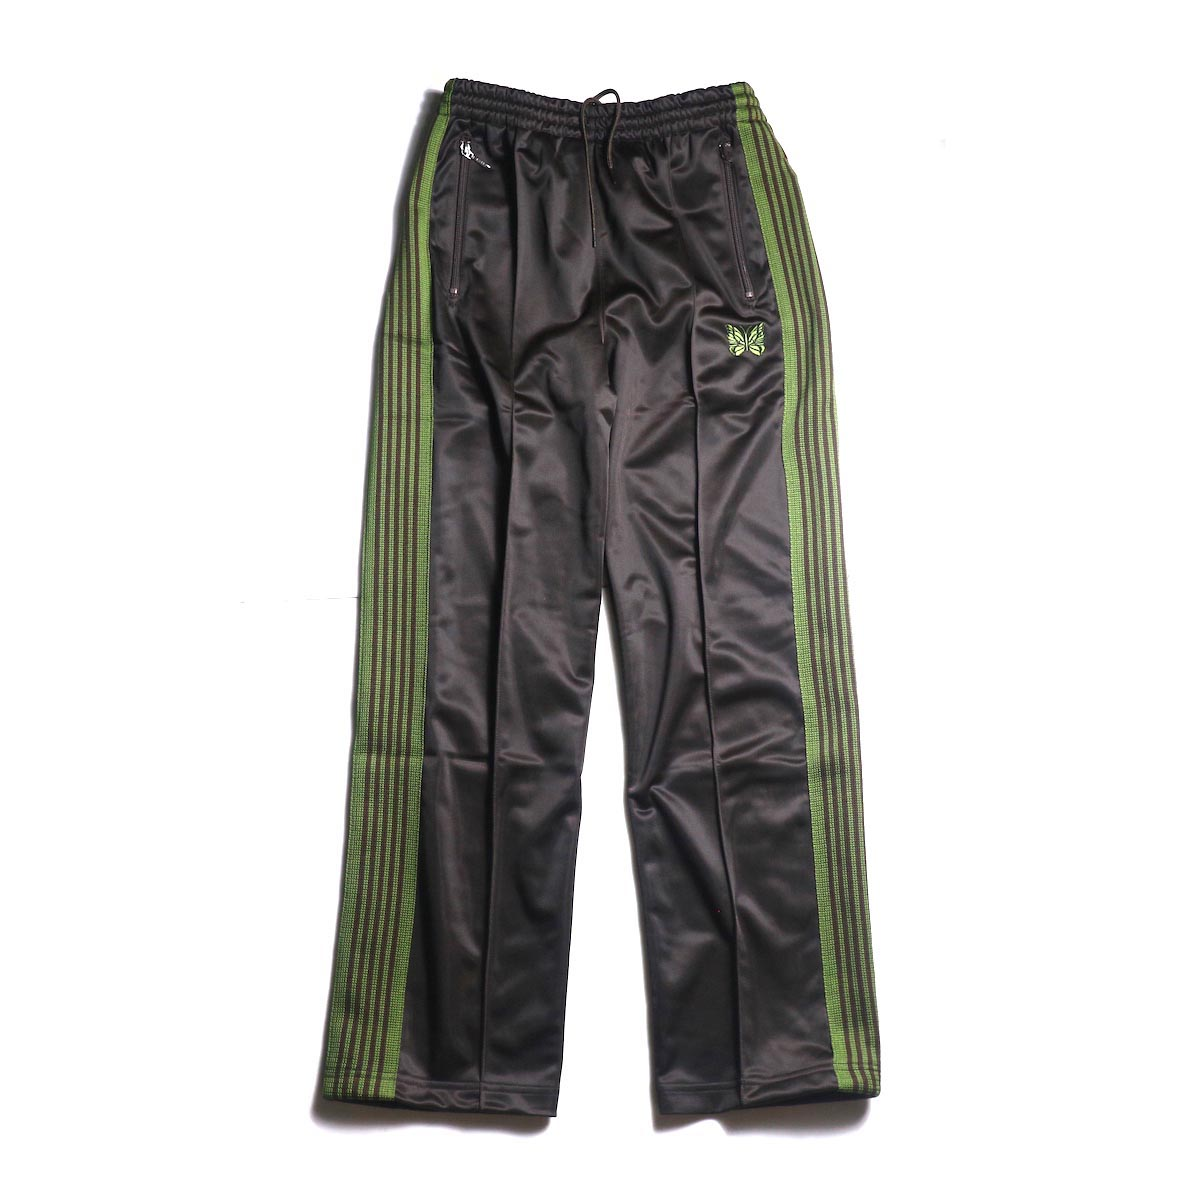 Needles / Track Pants -Pe/Ta Tricot (Brown)